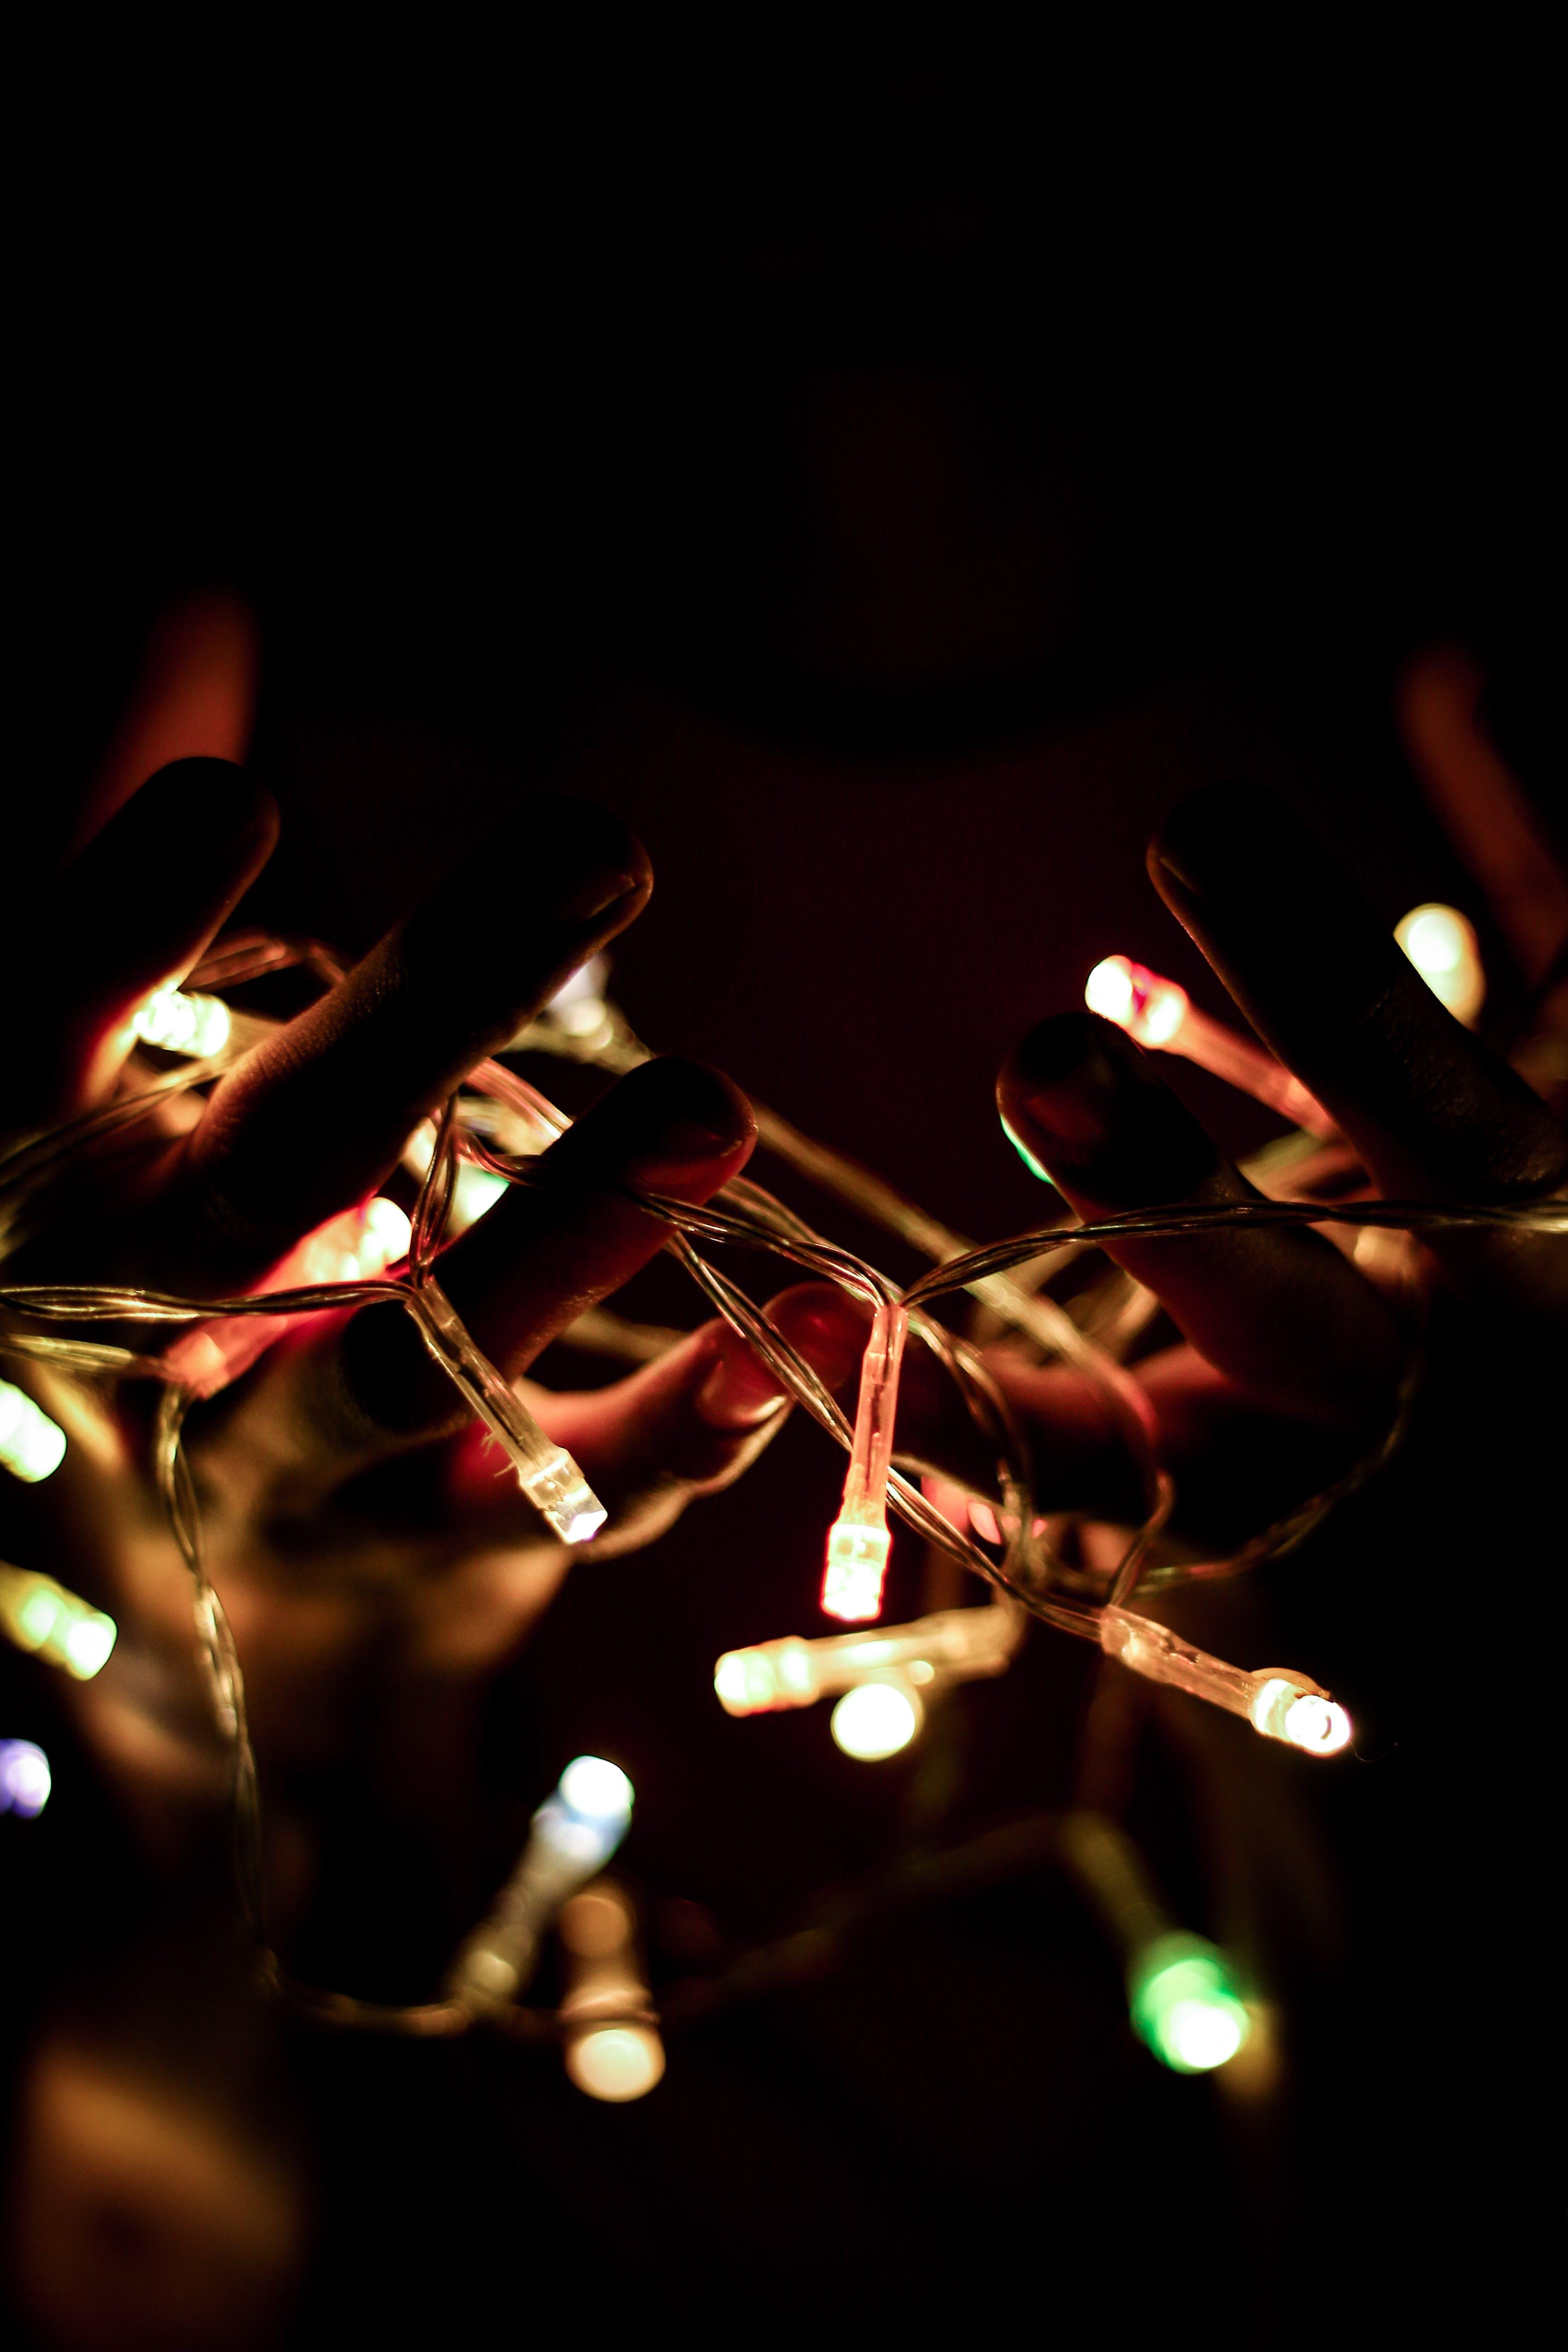 Christmas Lights Turned-on